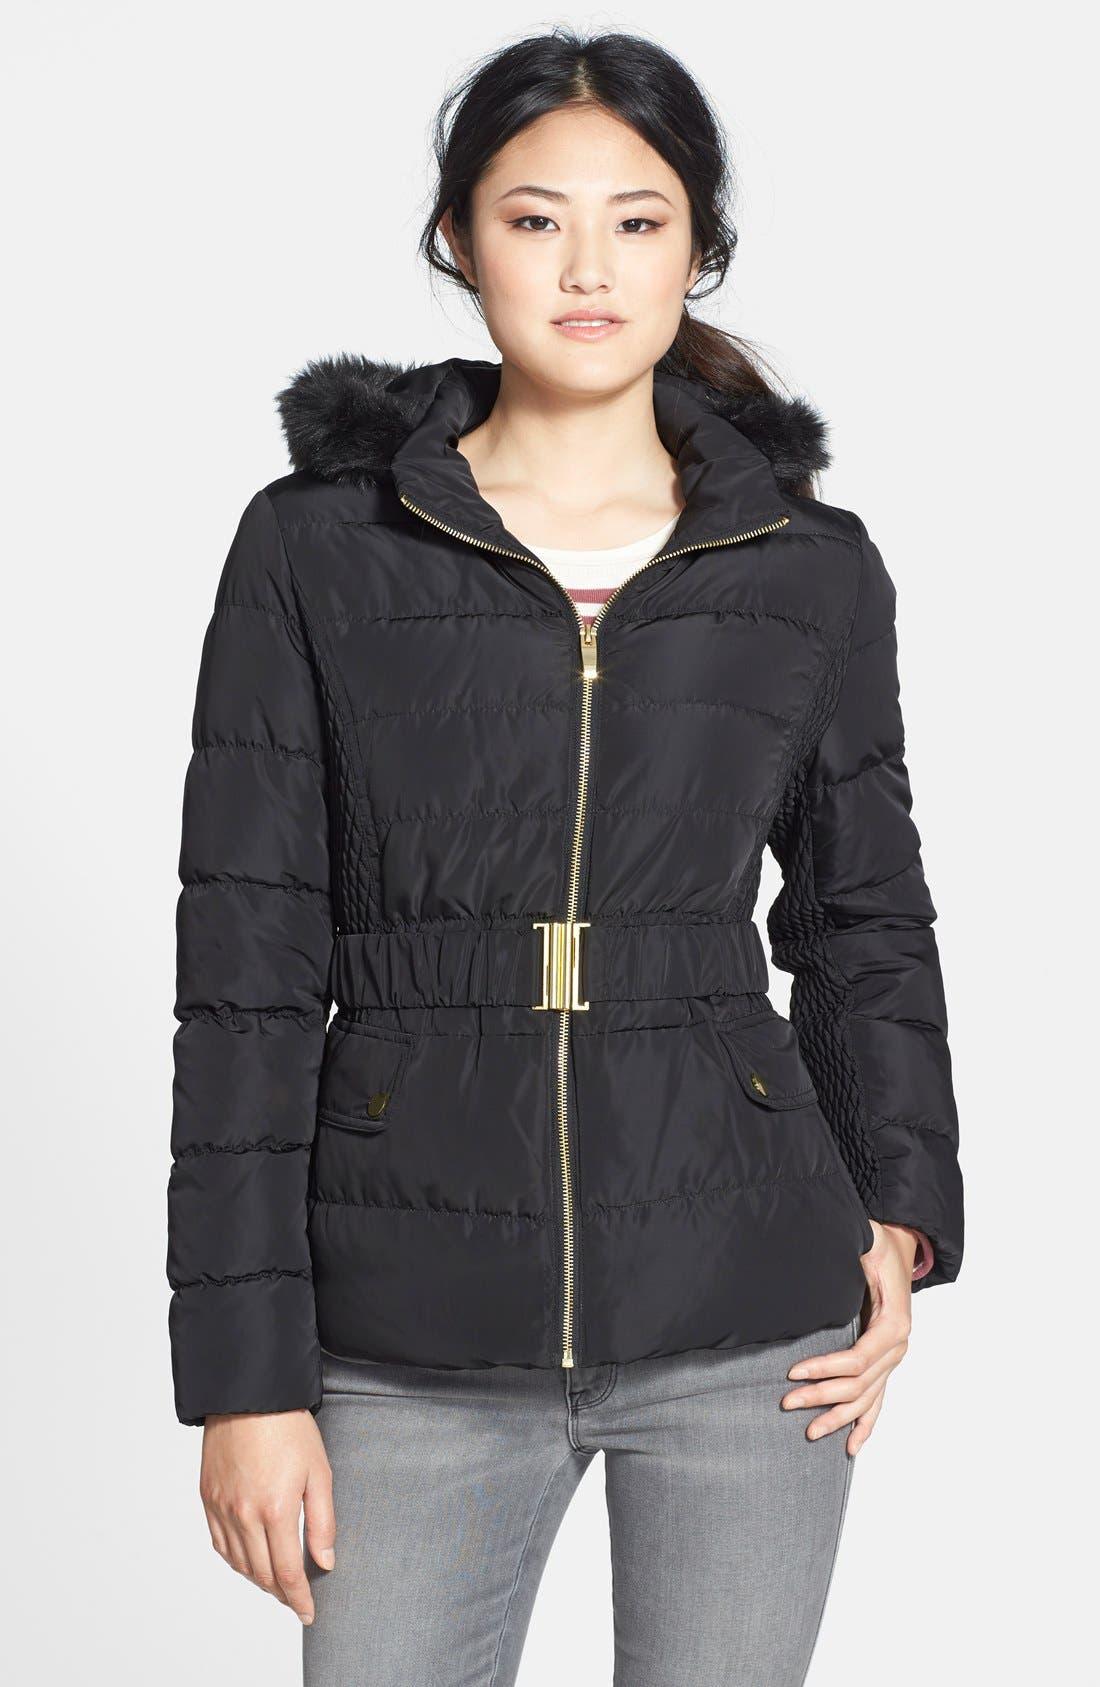 Alternate Image 1 Selected - Via Spiga Faux Fur Trim Hooded Puffer Jacket (Online Only)